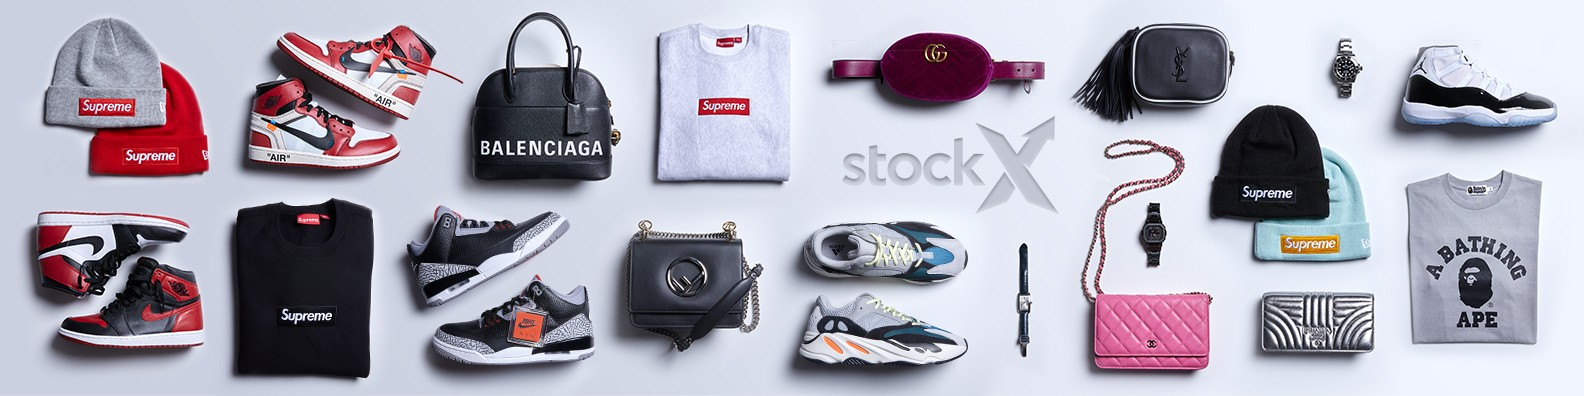 StockX | LinkedIn